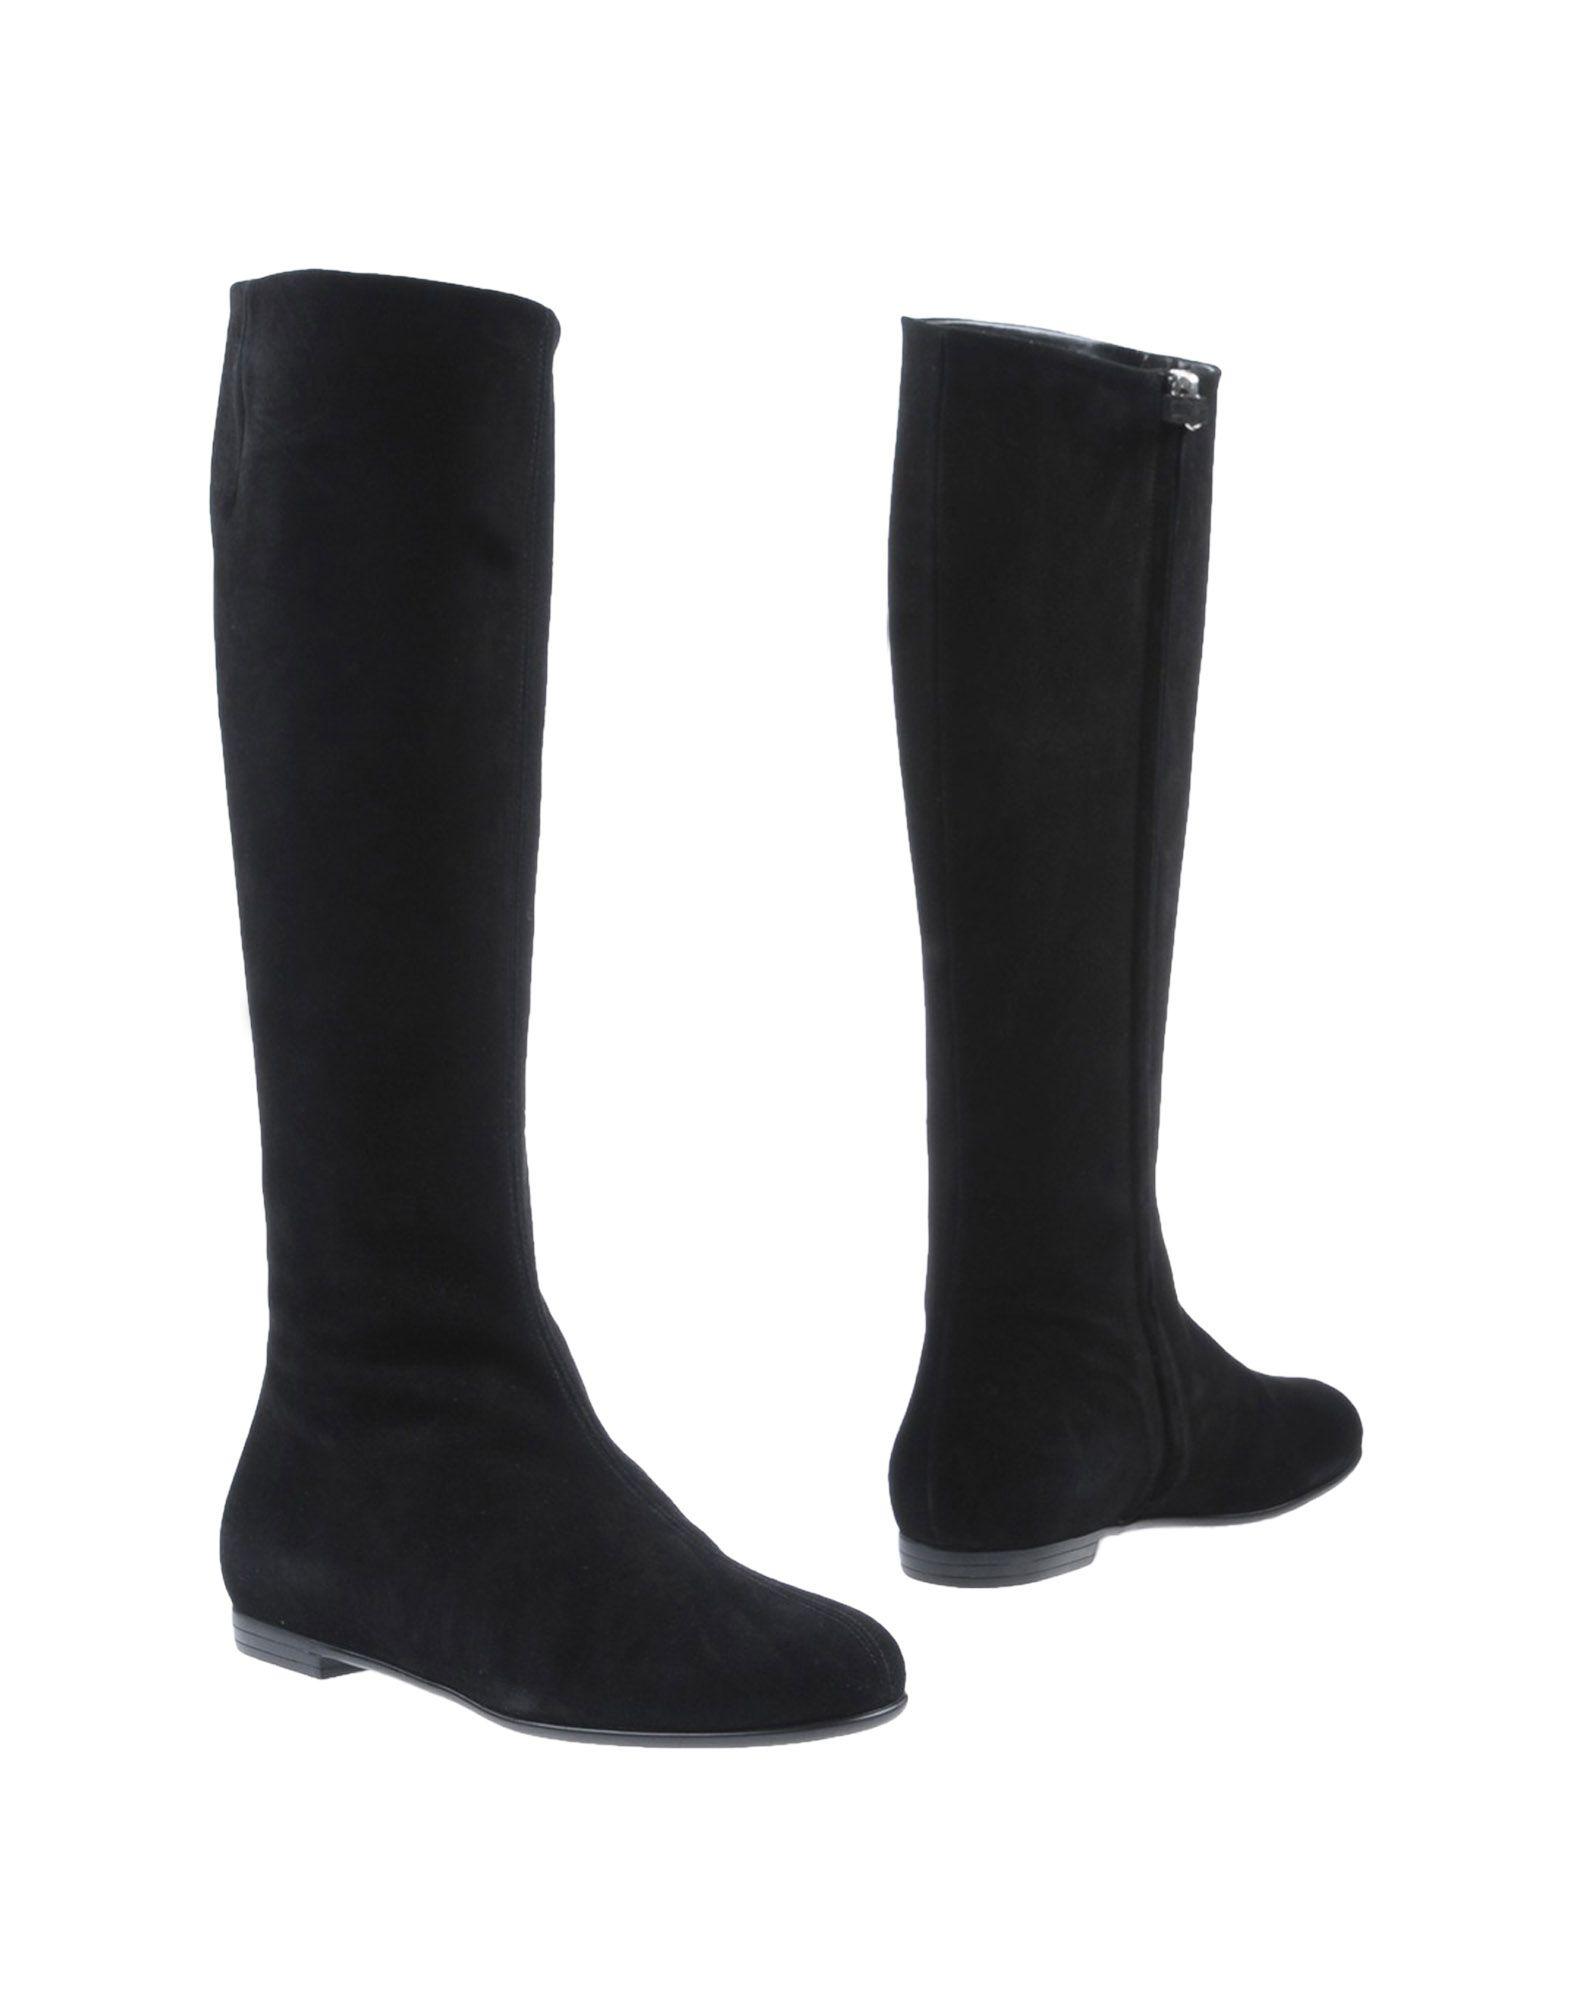 Giuseppe Zanotti Stiefel Damen  Schuhe 11312126WFGünstige gut aussehende Schuhe  2e72ab